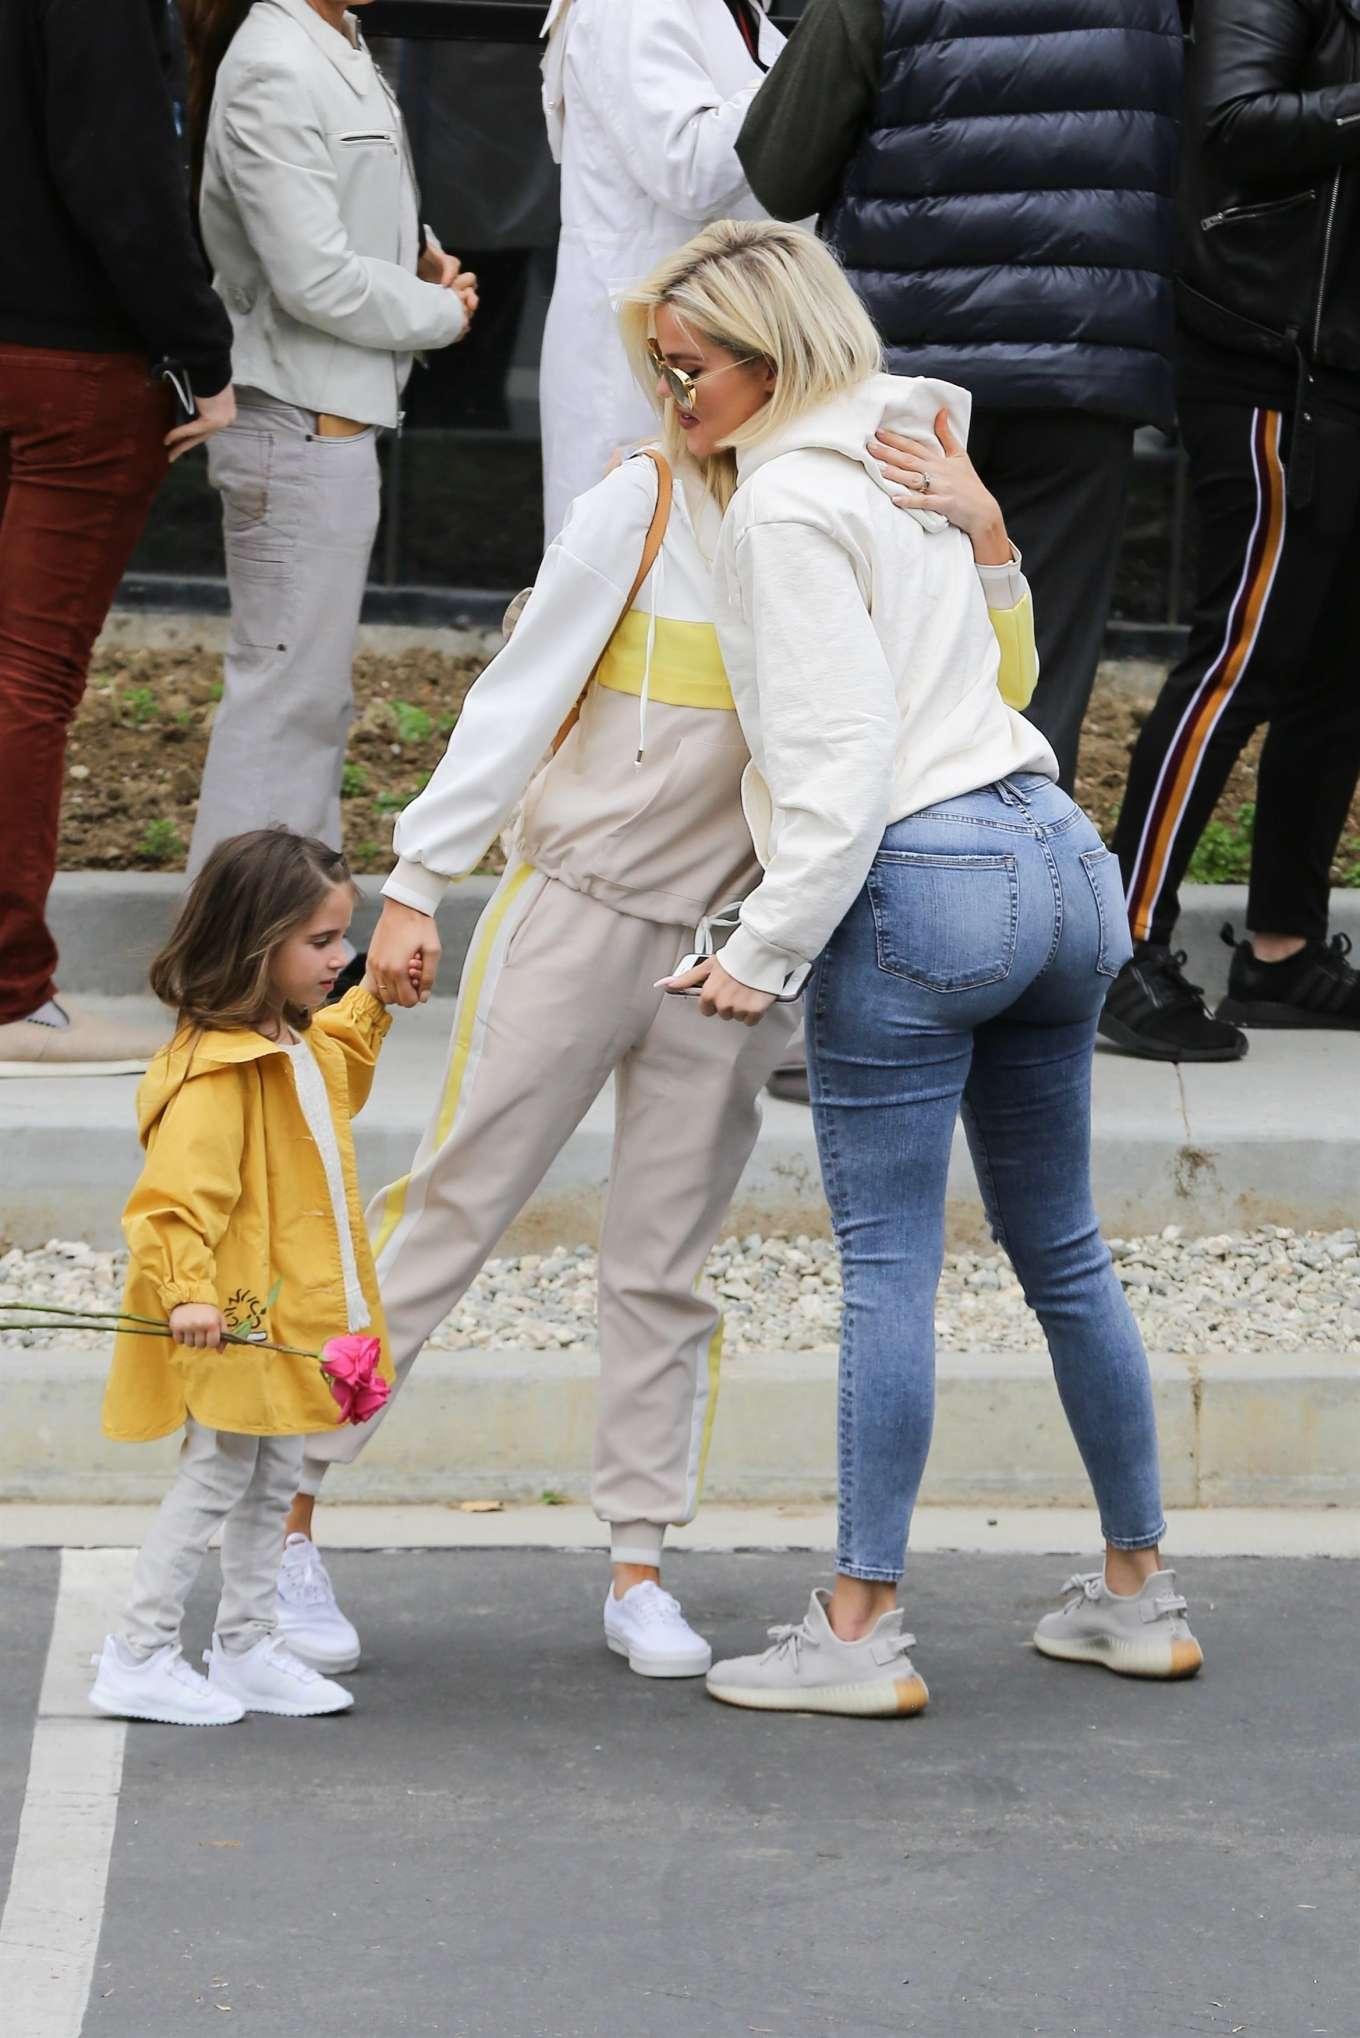 Khloe Kardashian 2019 : Khloe Kardashian at Kanye Wests Sunday church services-09